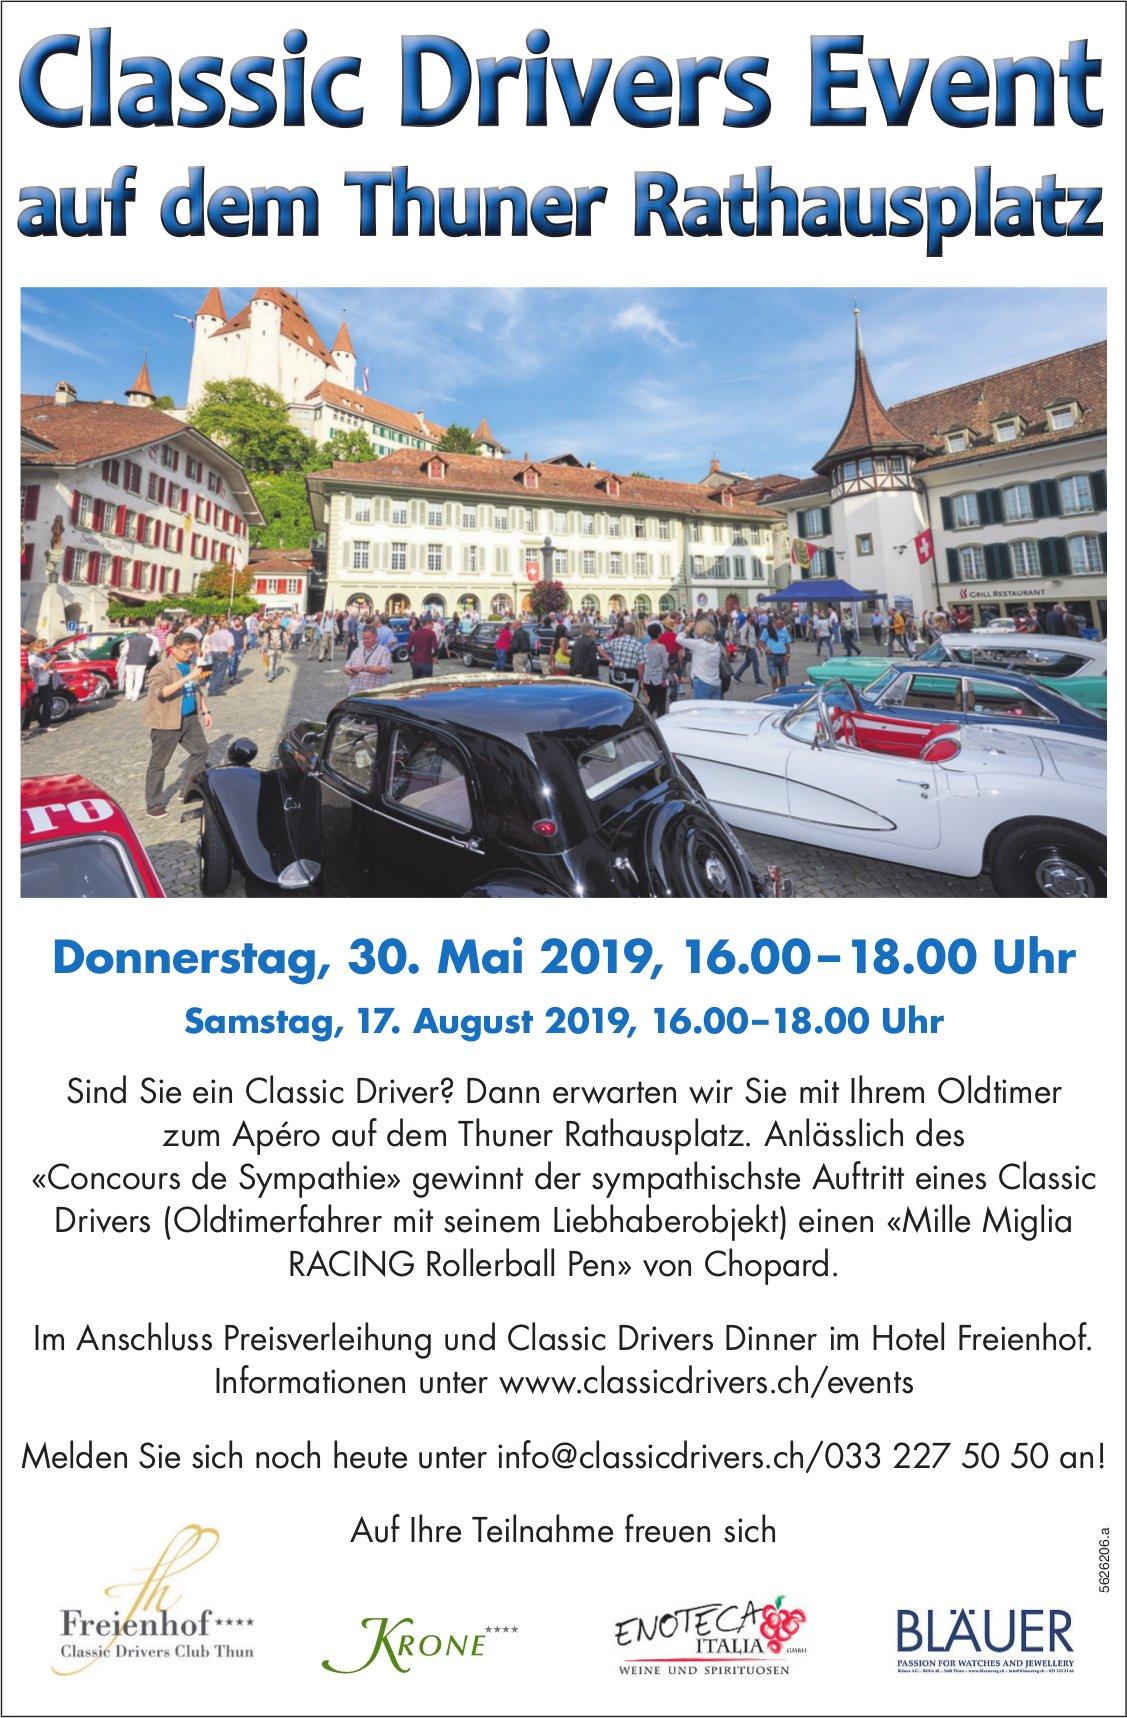 Classic Drivers Event auf dem Thuner Rathausplatz am 30. Mai